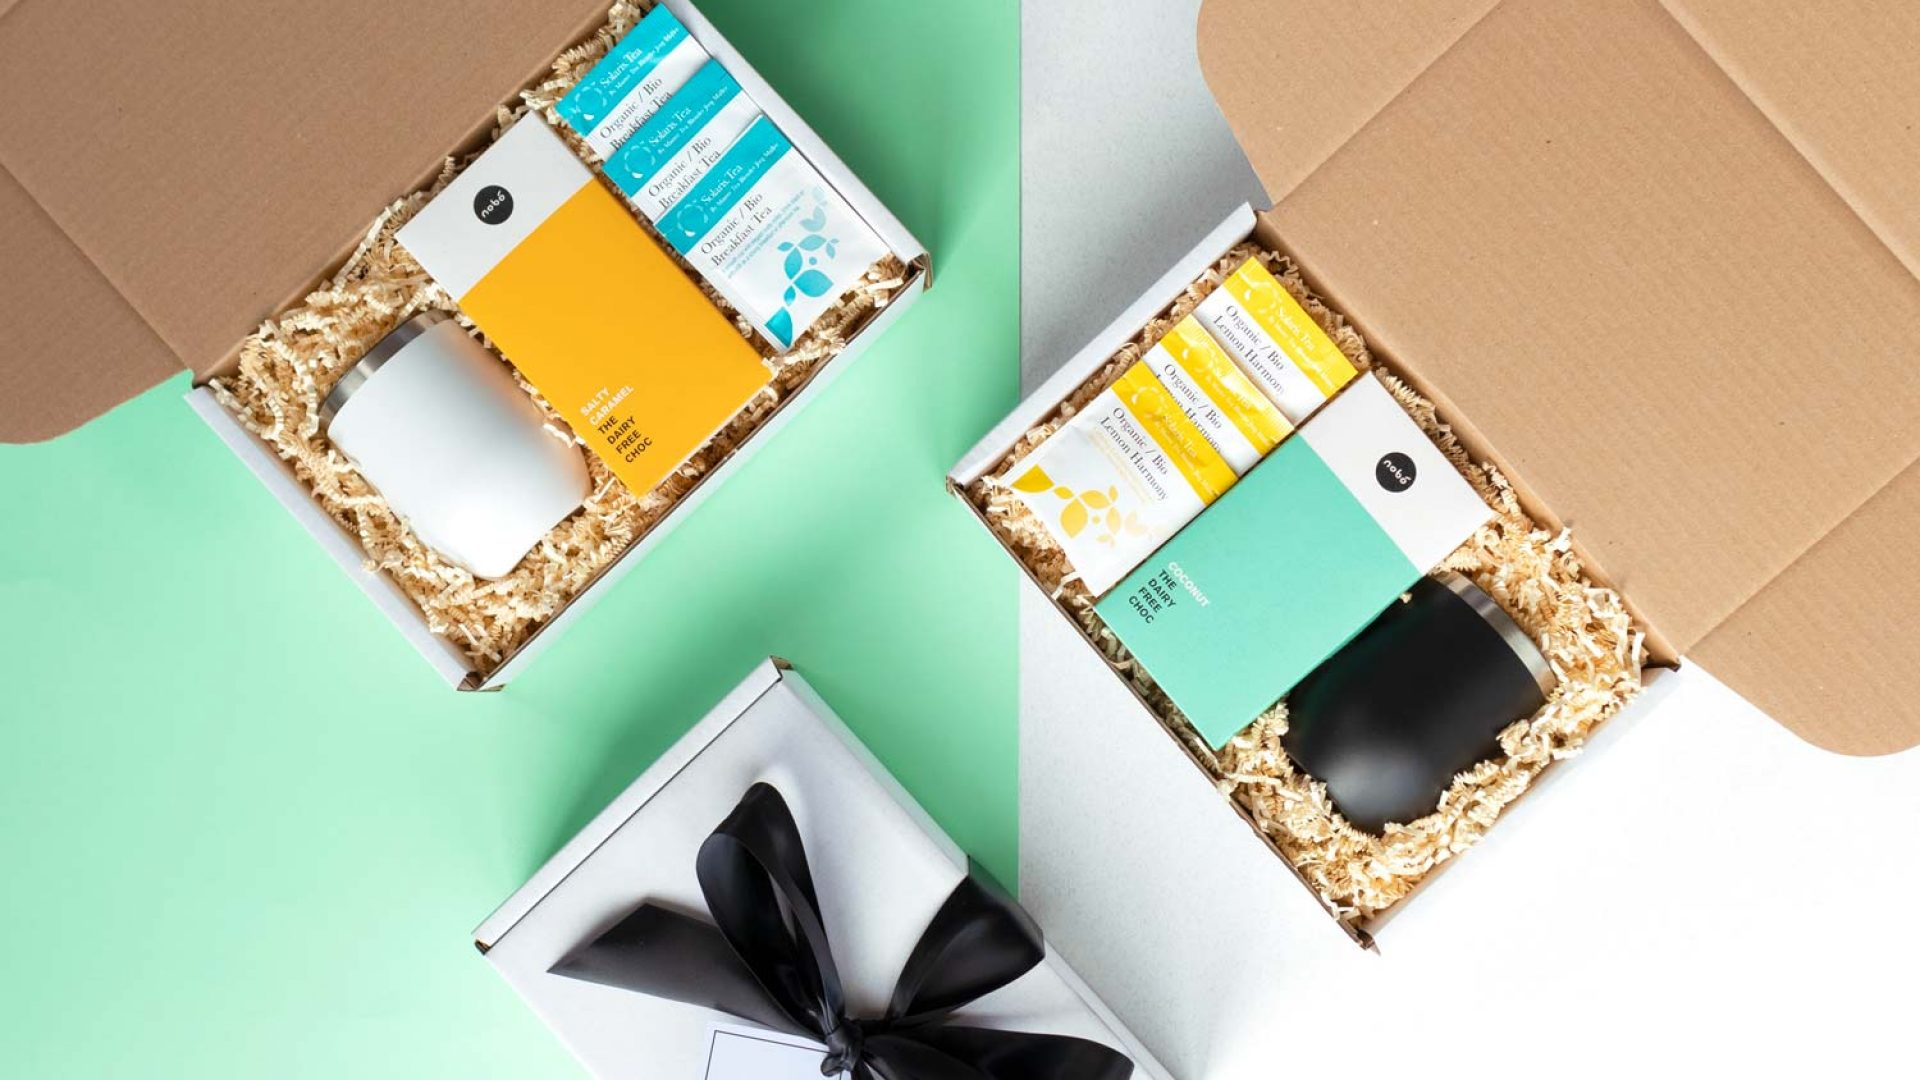 Corporate-Gift-Boxes-Ireland_Vixi-Gifting_02-v2